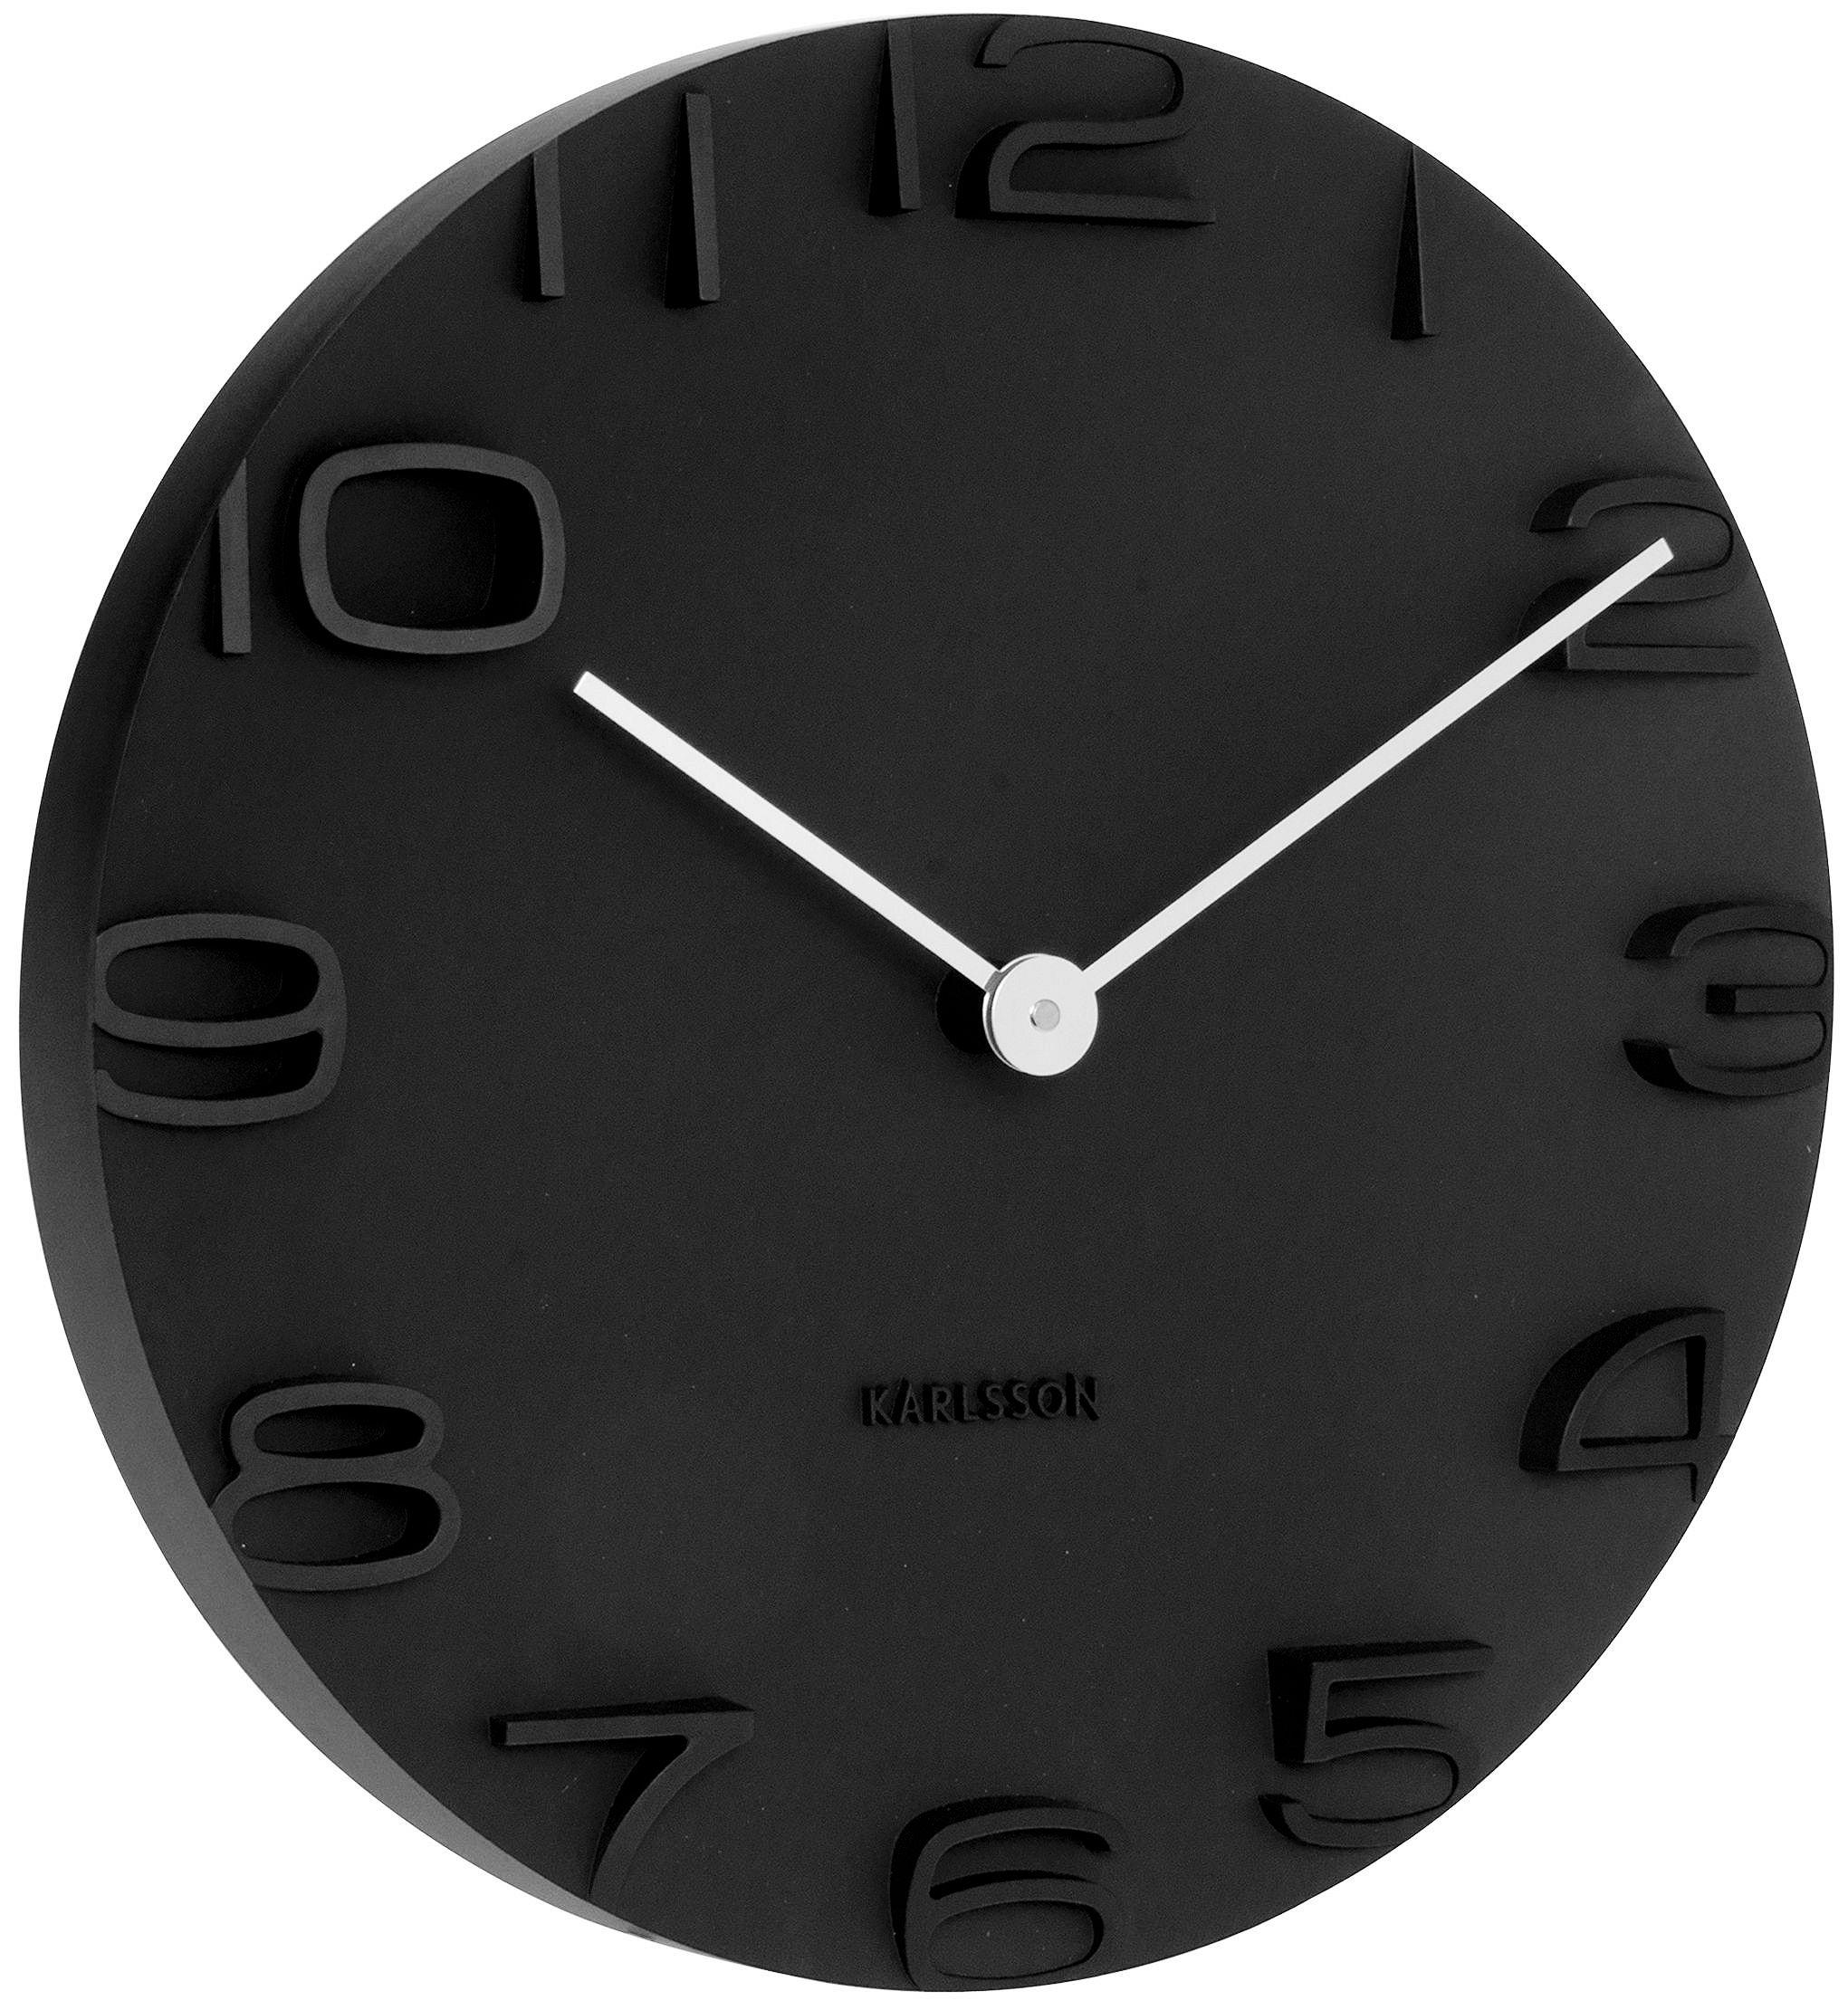 Wanduhren Modern Design Wanduhr Edge Clock Big Moderne: Karlsson Wanduhr On The Edge KA5311BK Online Günstig